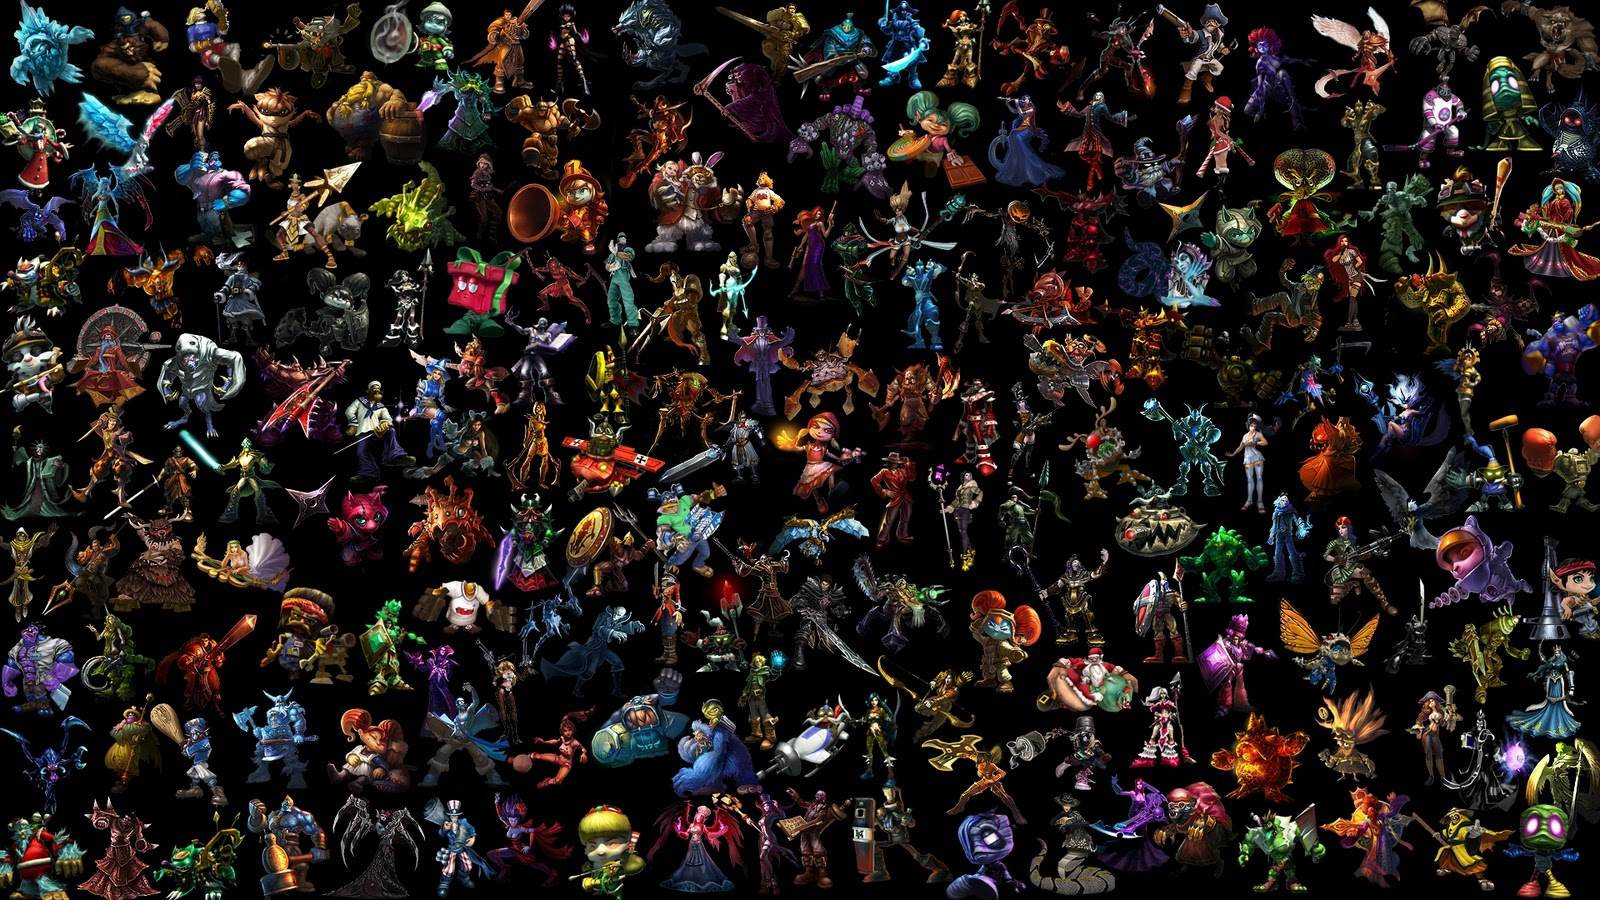 Lol Wallpapers: League Of Legends Wallpaper: My EpiK LoL Wallpaper